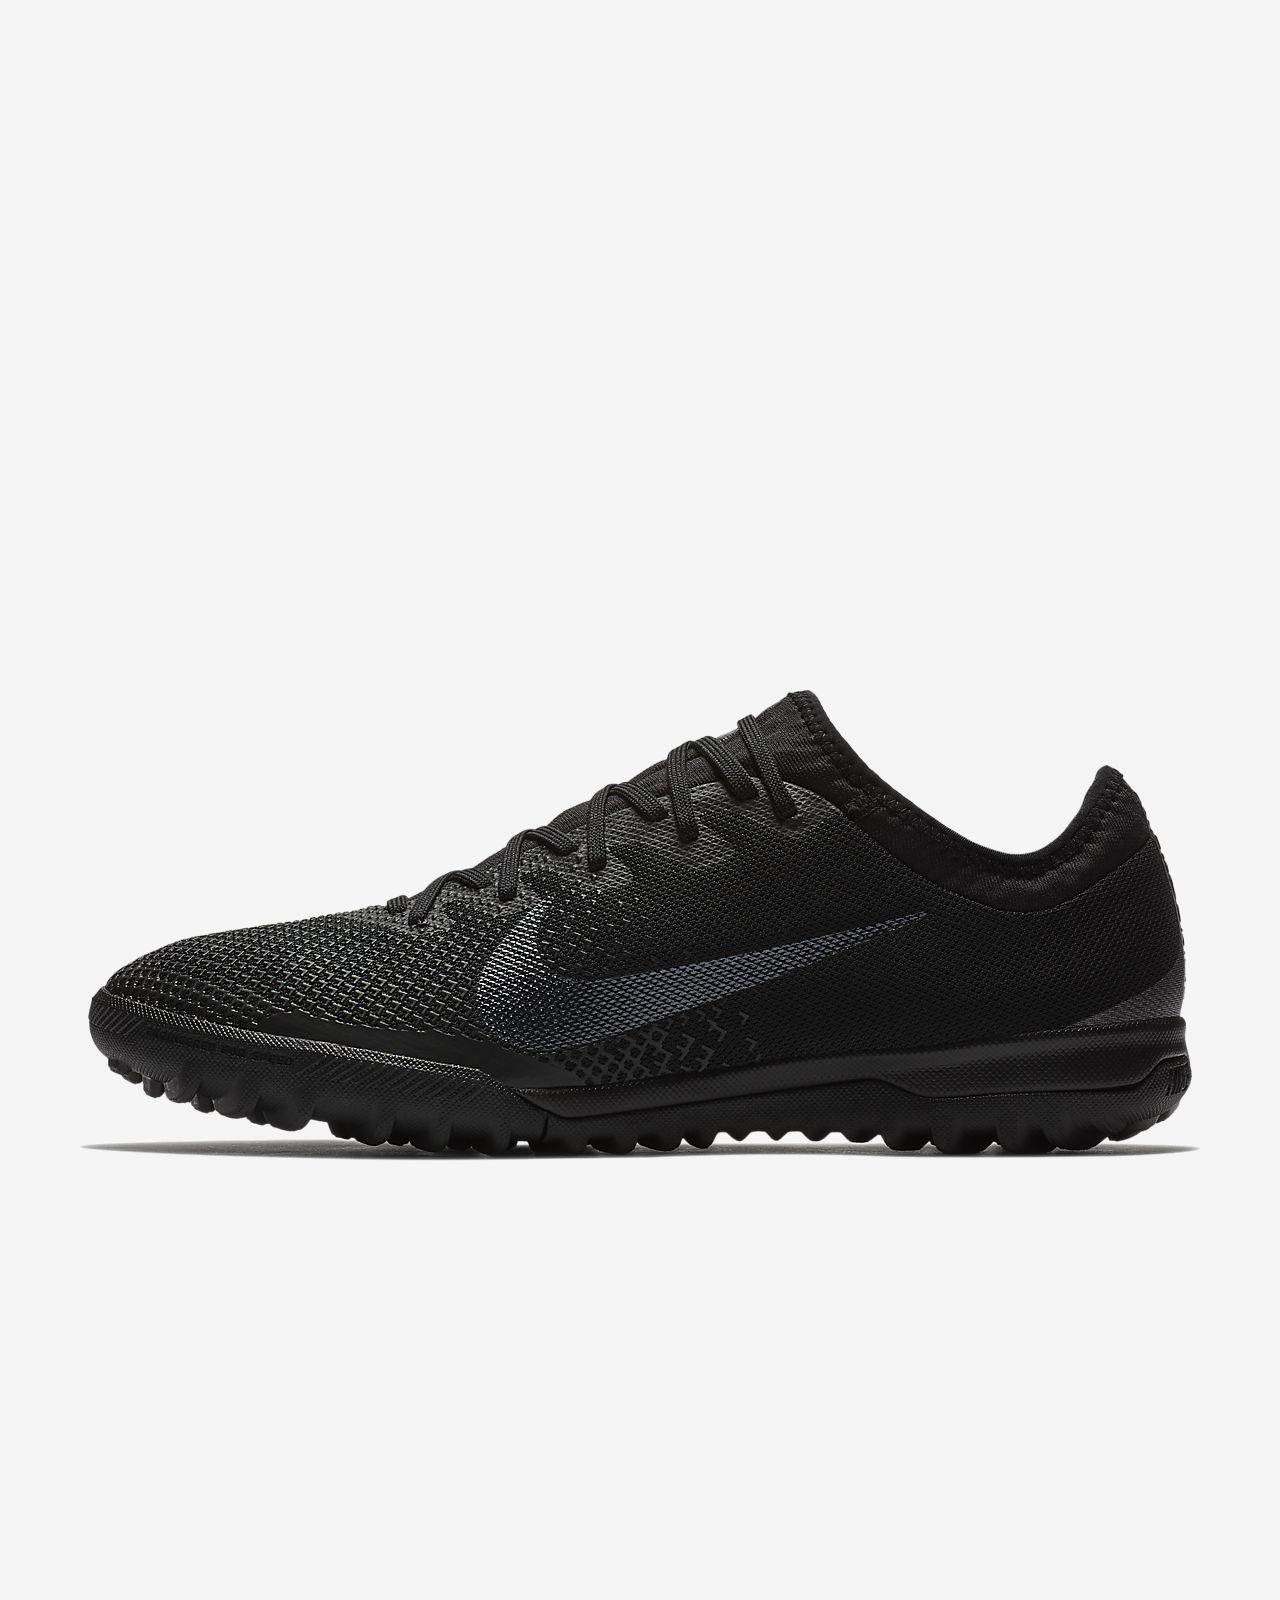 Nike Mercurialx Vapor Xii Pro Tf Turf Soccer Shoe